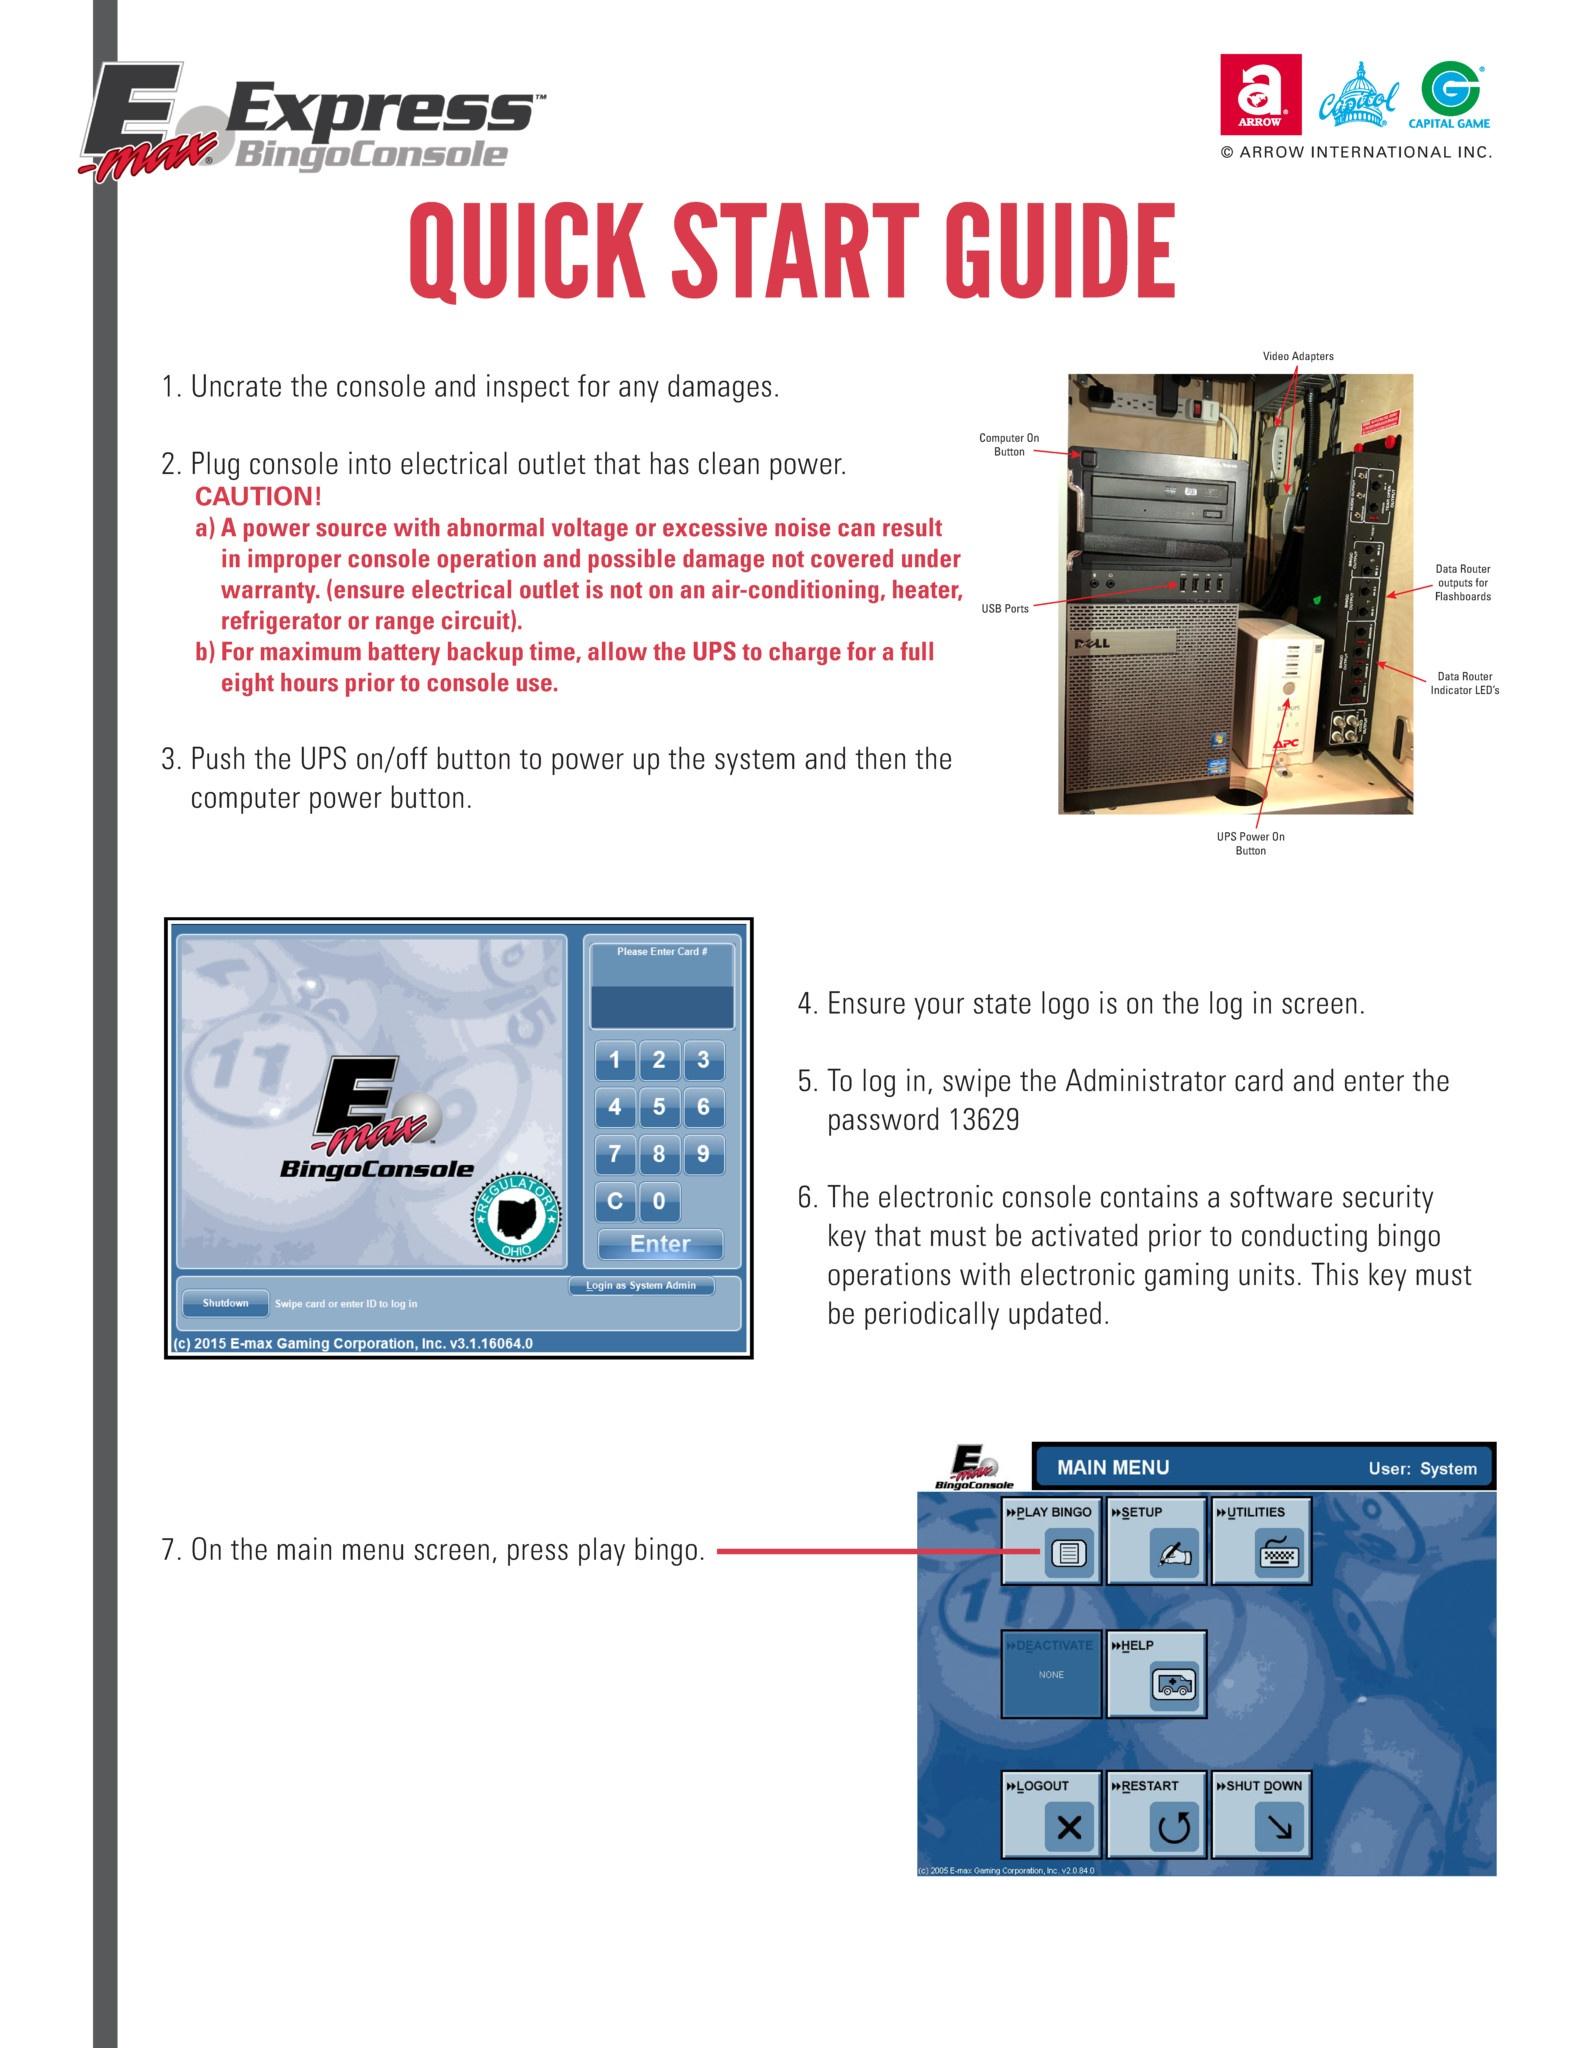 E-max Express Quick Start Guide Equipment Manuals/Quick Start Guides